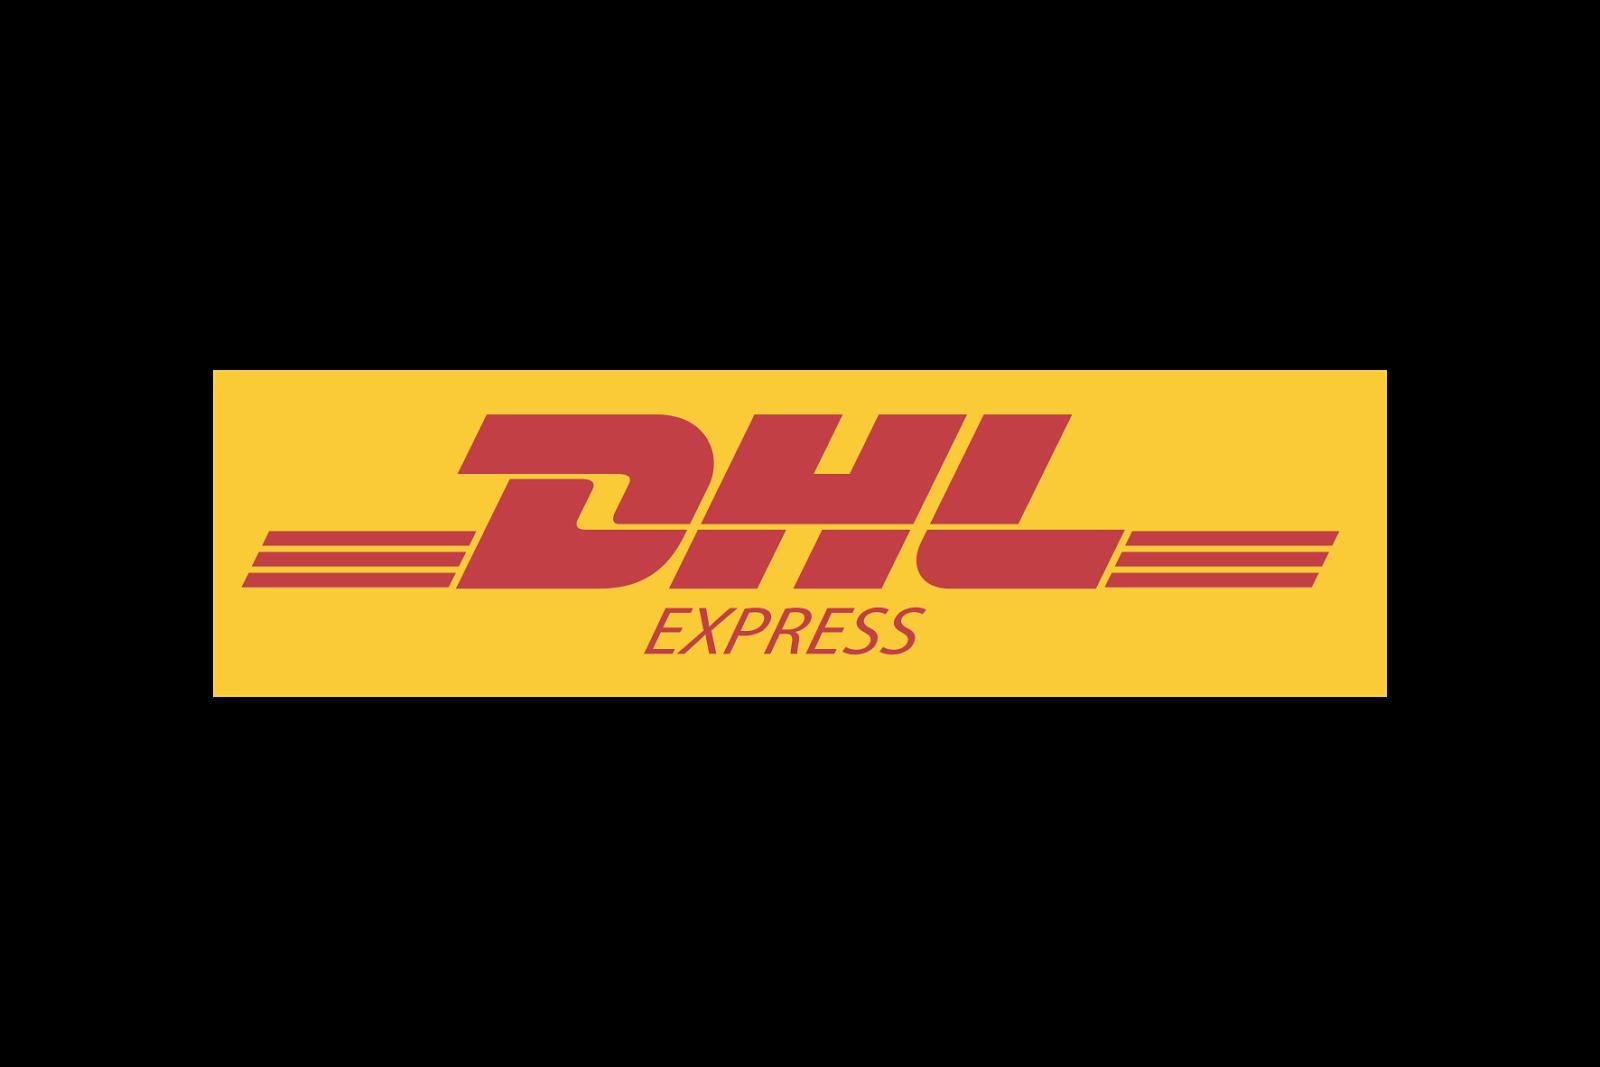 dhl express logo logoshare